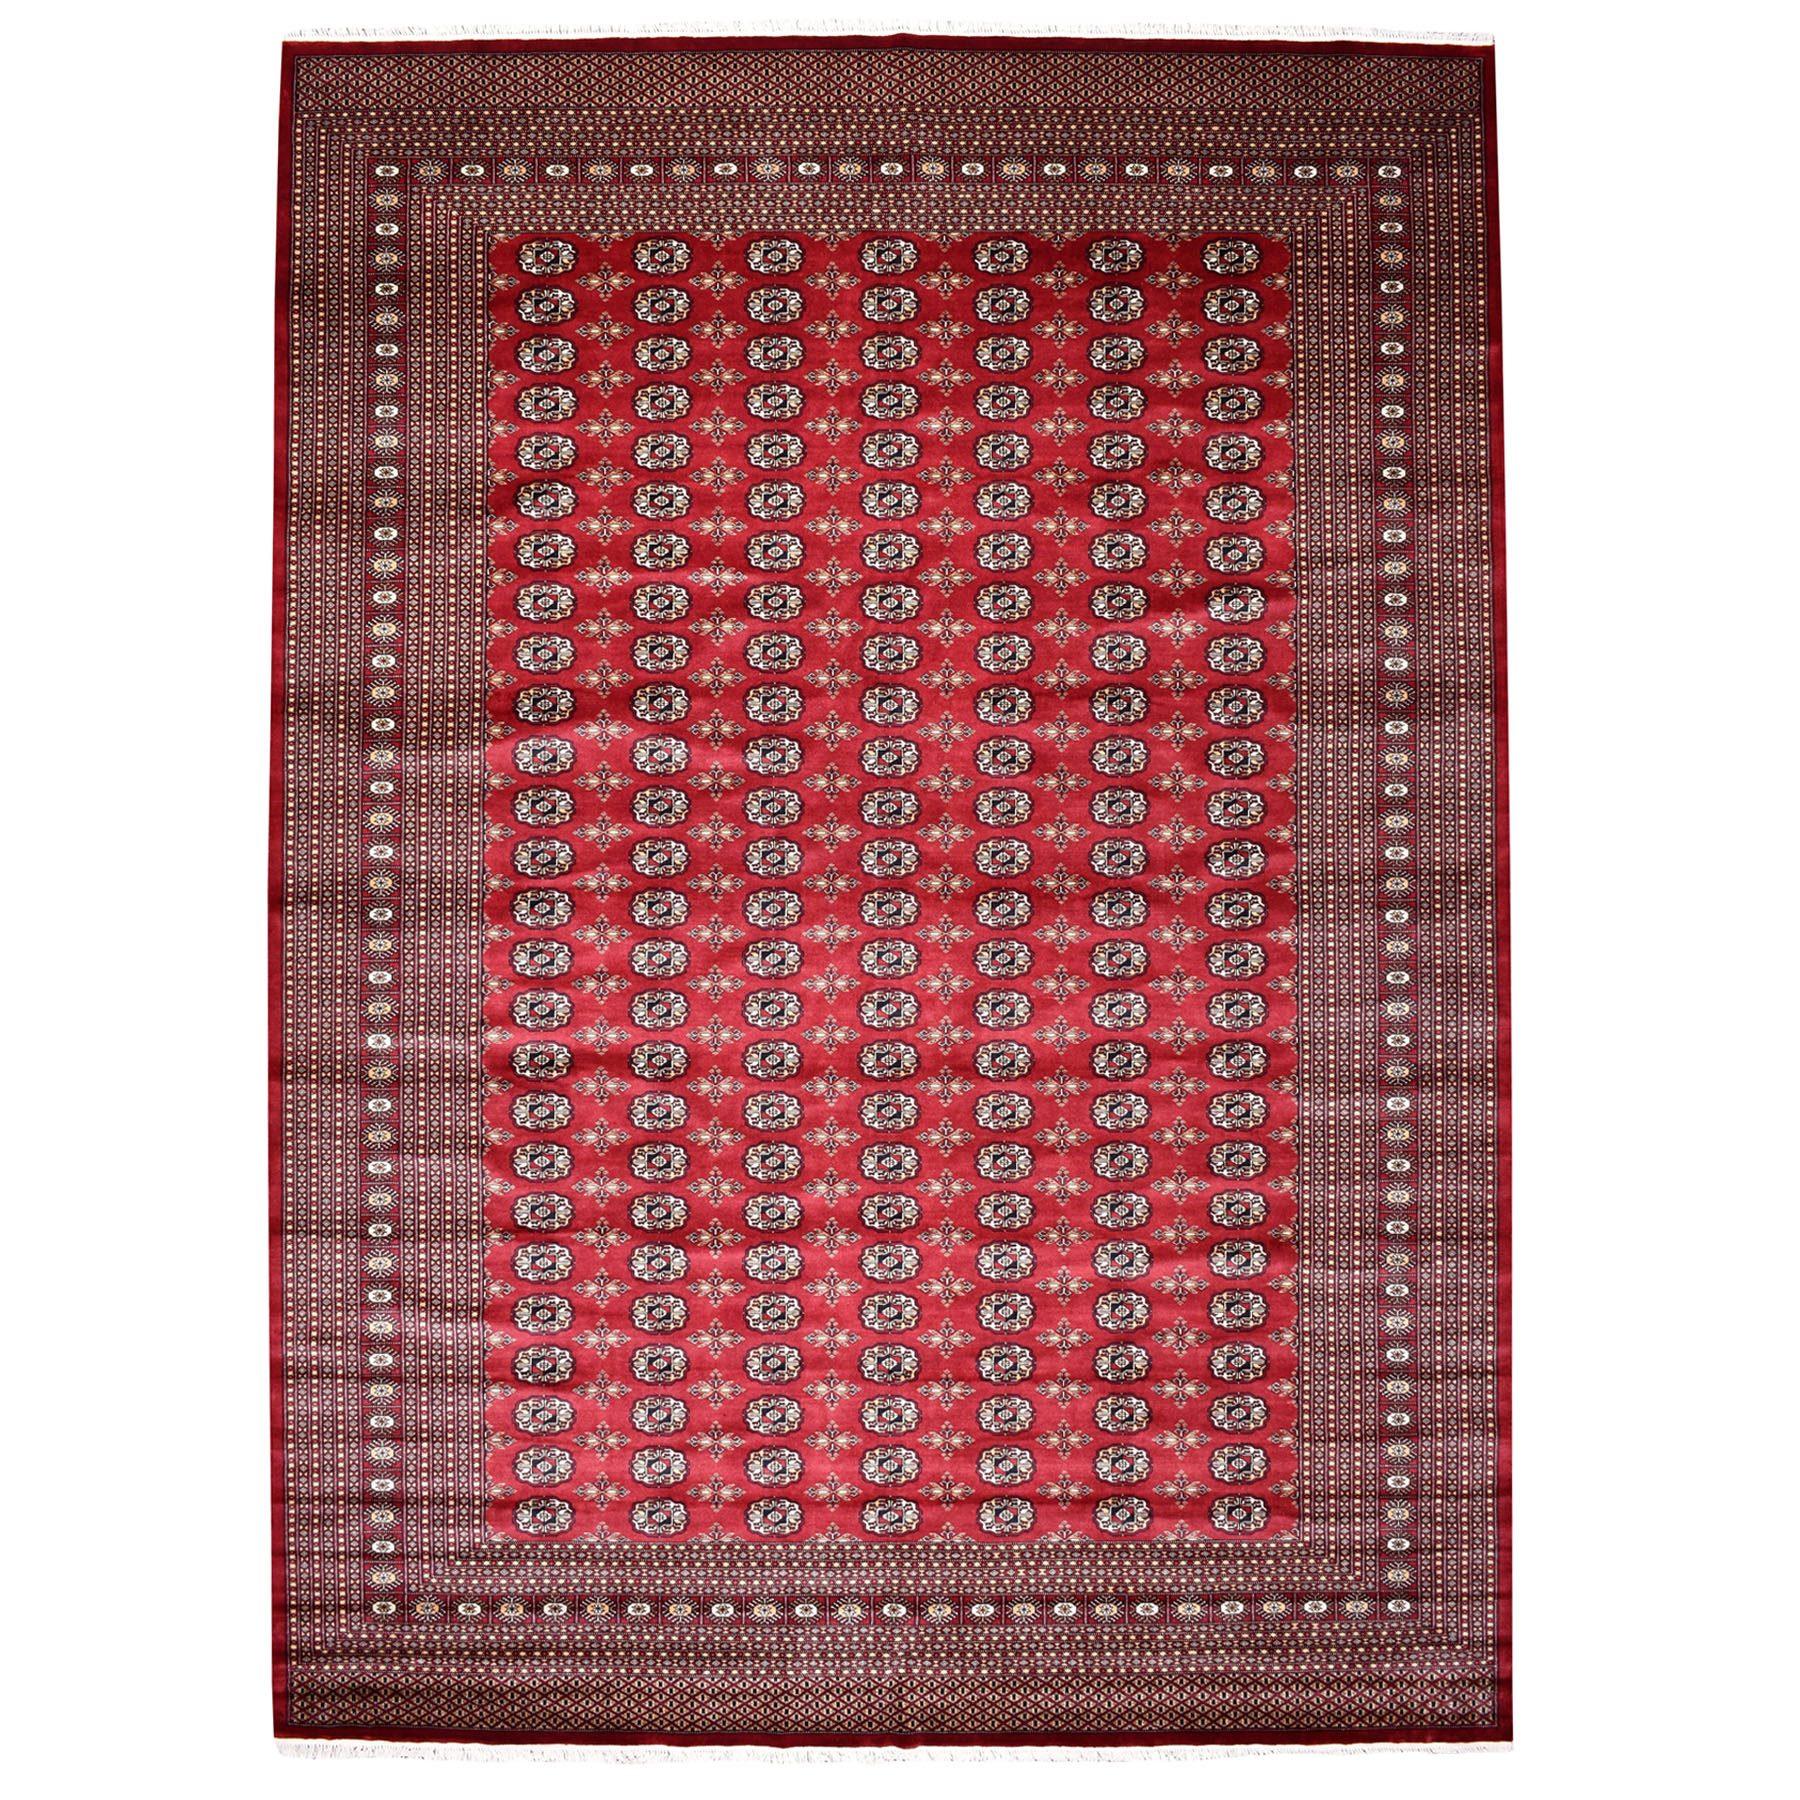 "9'x12'3"" Red Super Fine Mori Bokara Elephant Feet Design Hand-Knotted Oriental Rug"